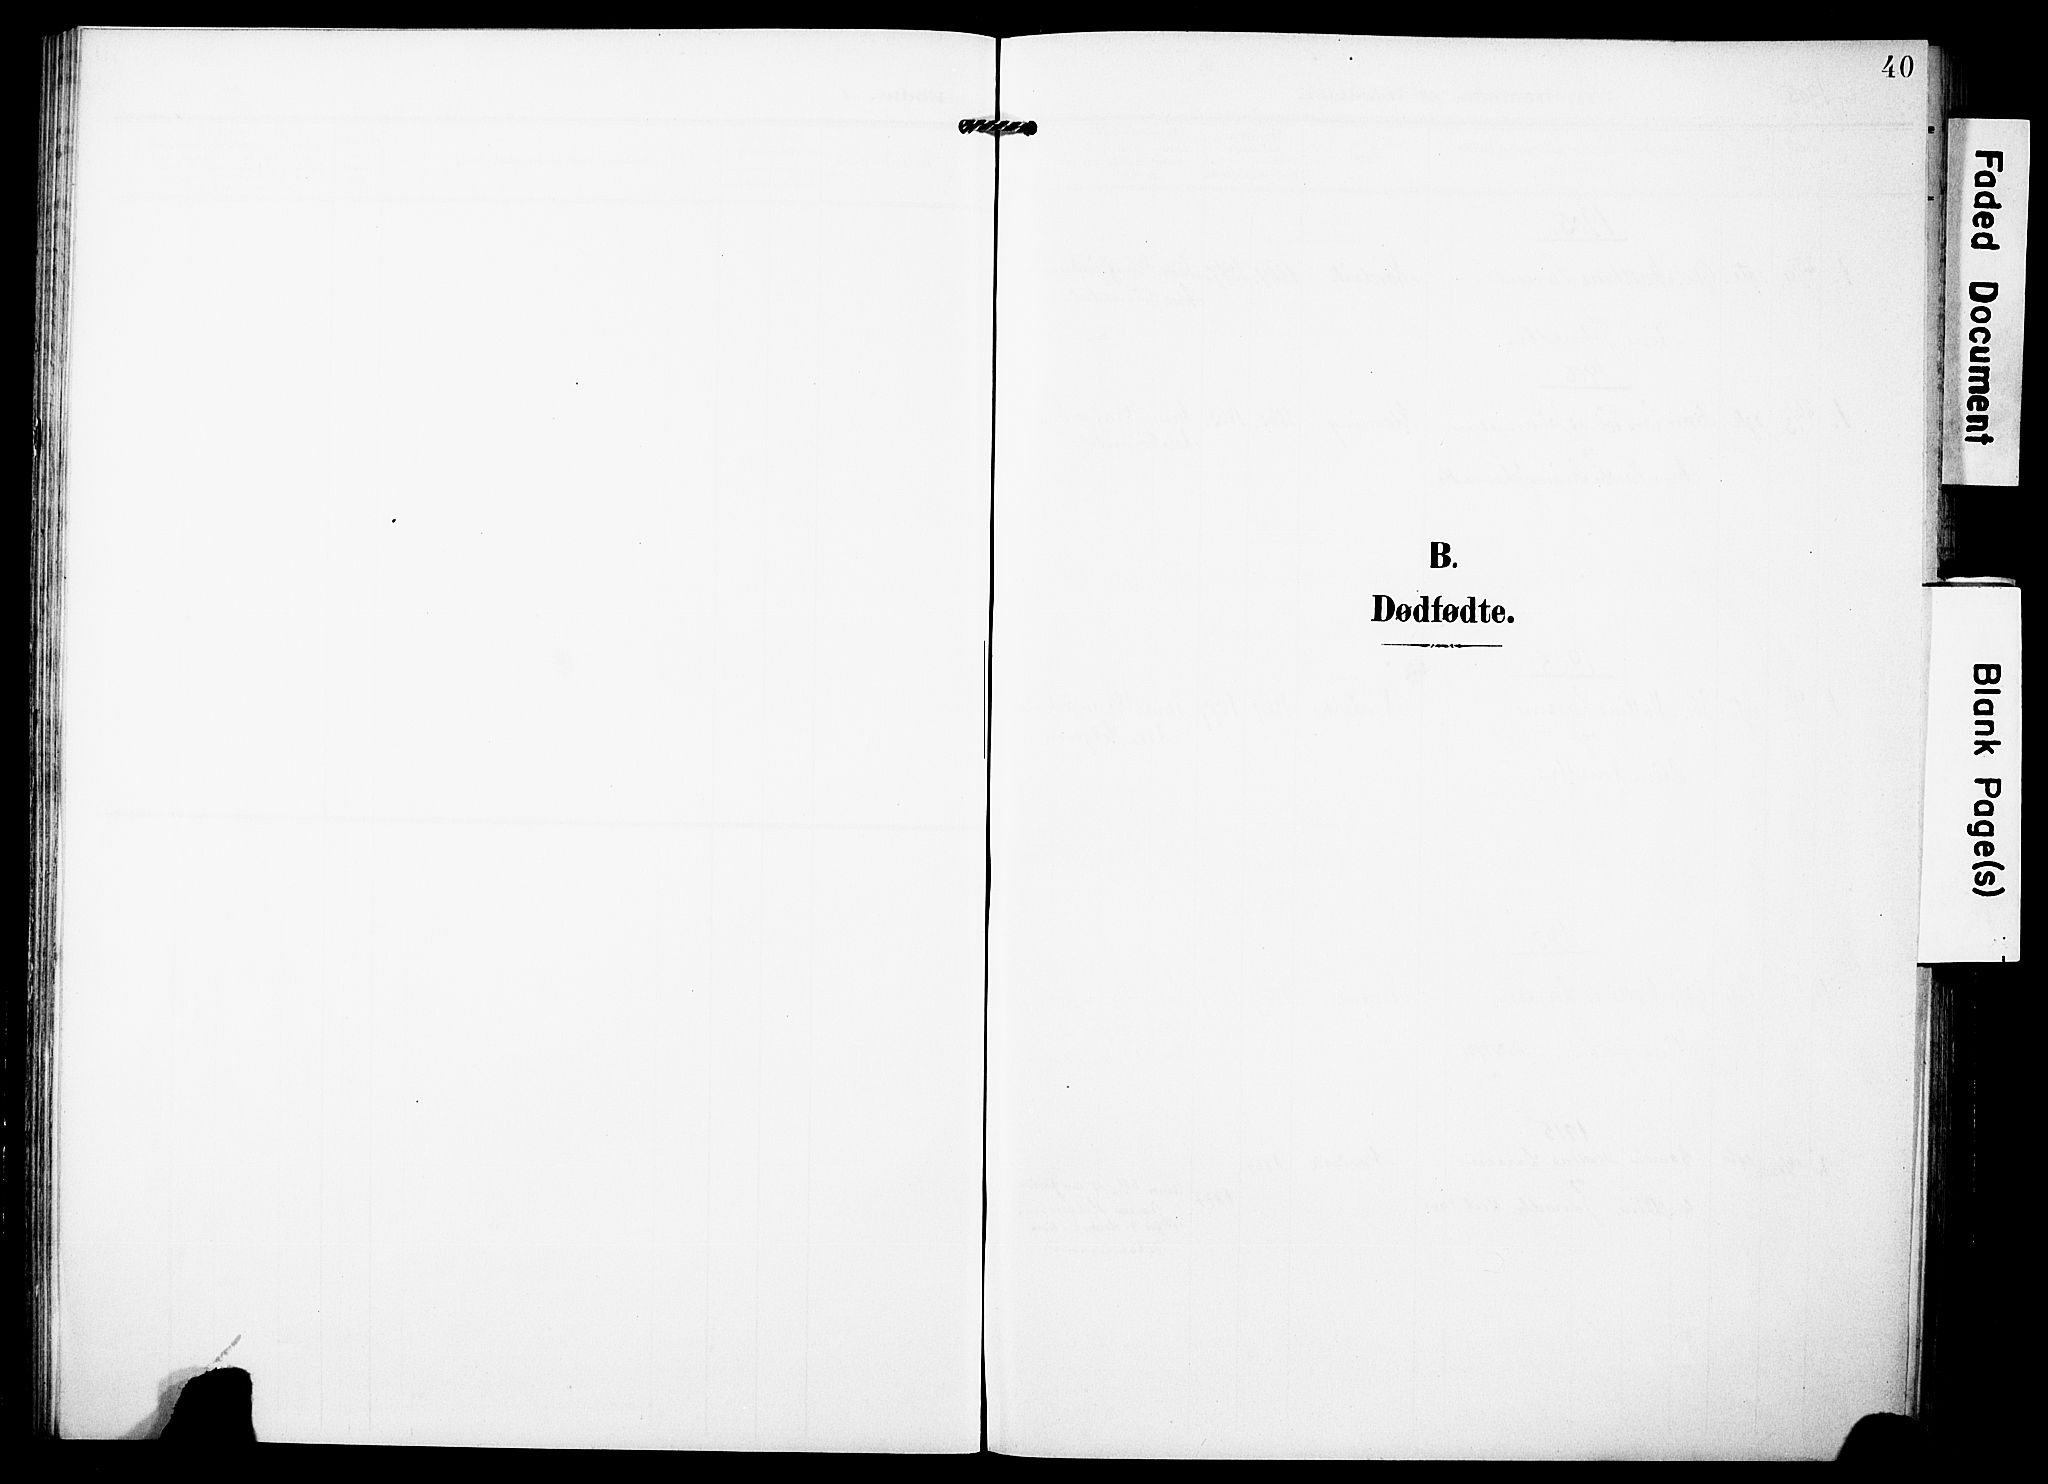 SAST, Torvastad sokneprestkontor, H/Ha/Haa/L0018: Ministerialbok nr. A 17, 1903-1925, s. 40